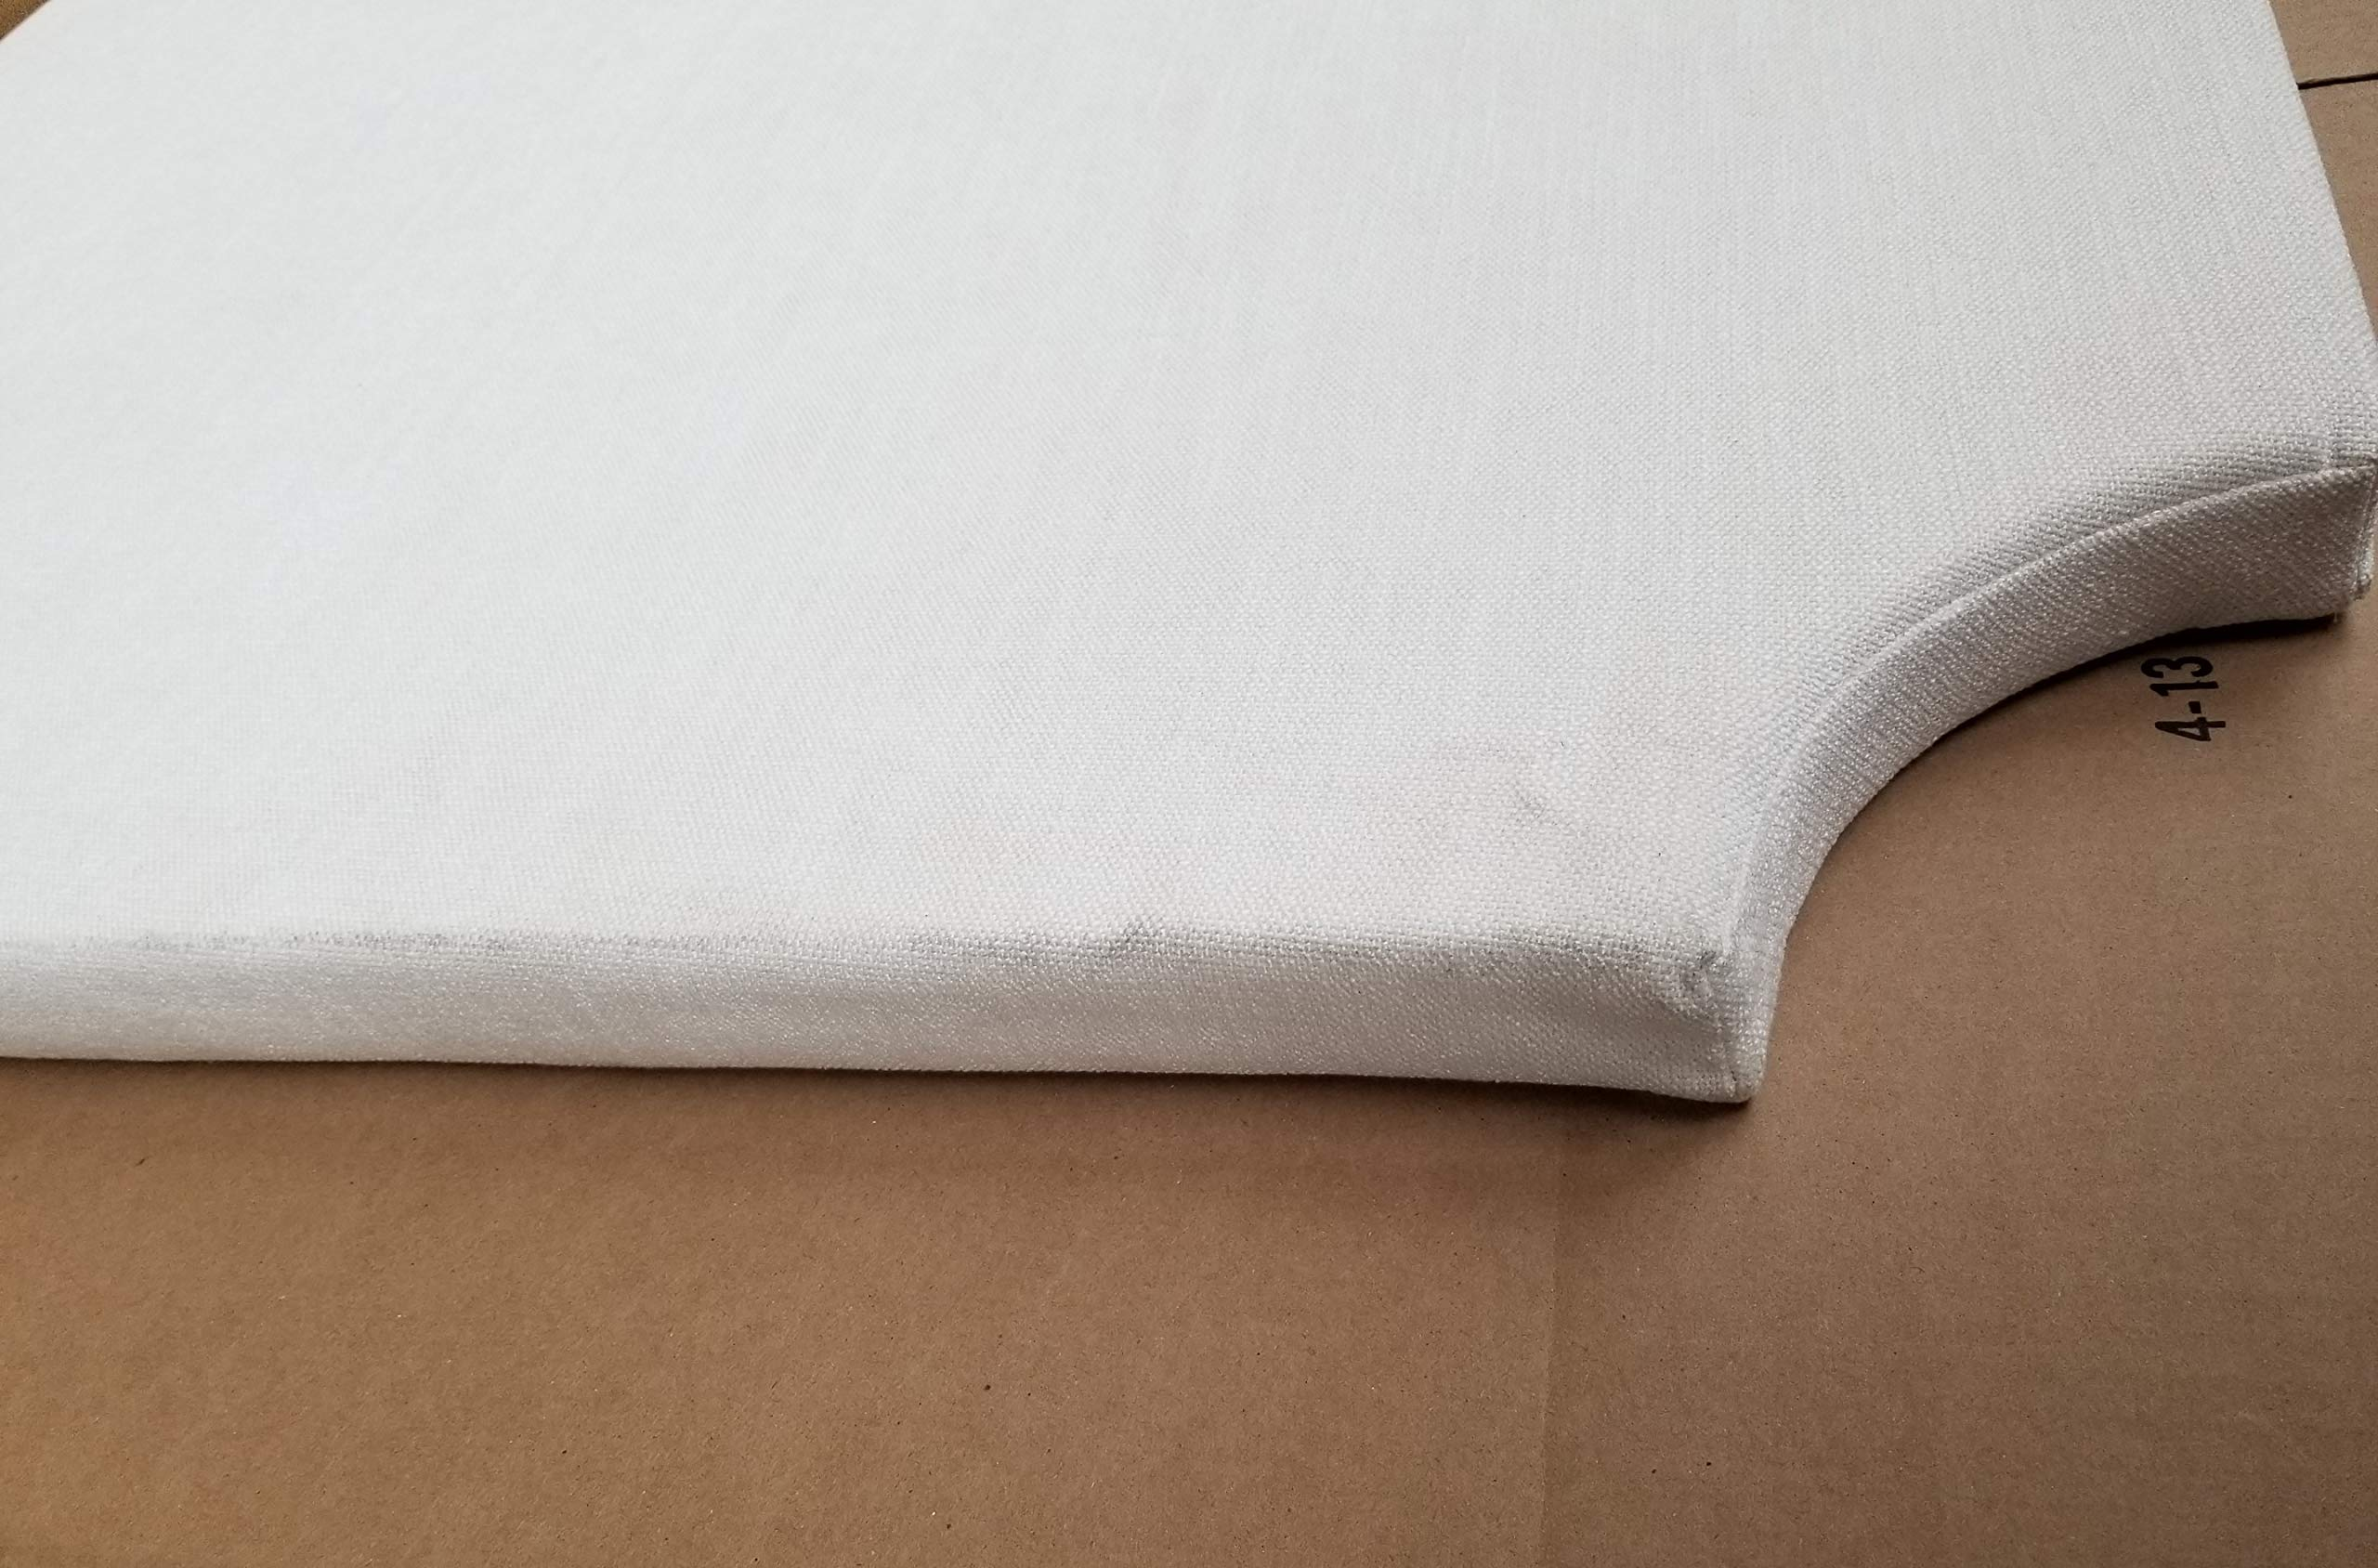 DIY Headboard - College Bedding Headboard (Slight Dirt Smudges)